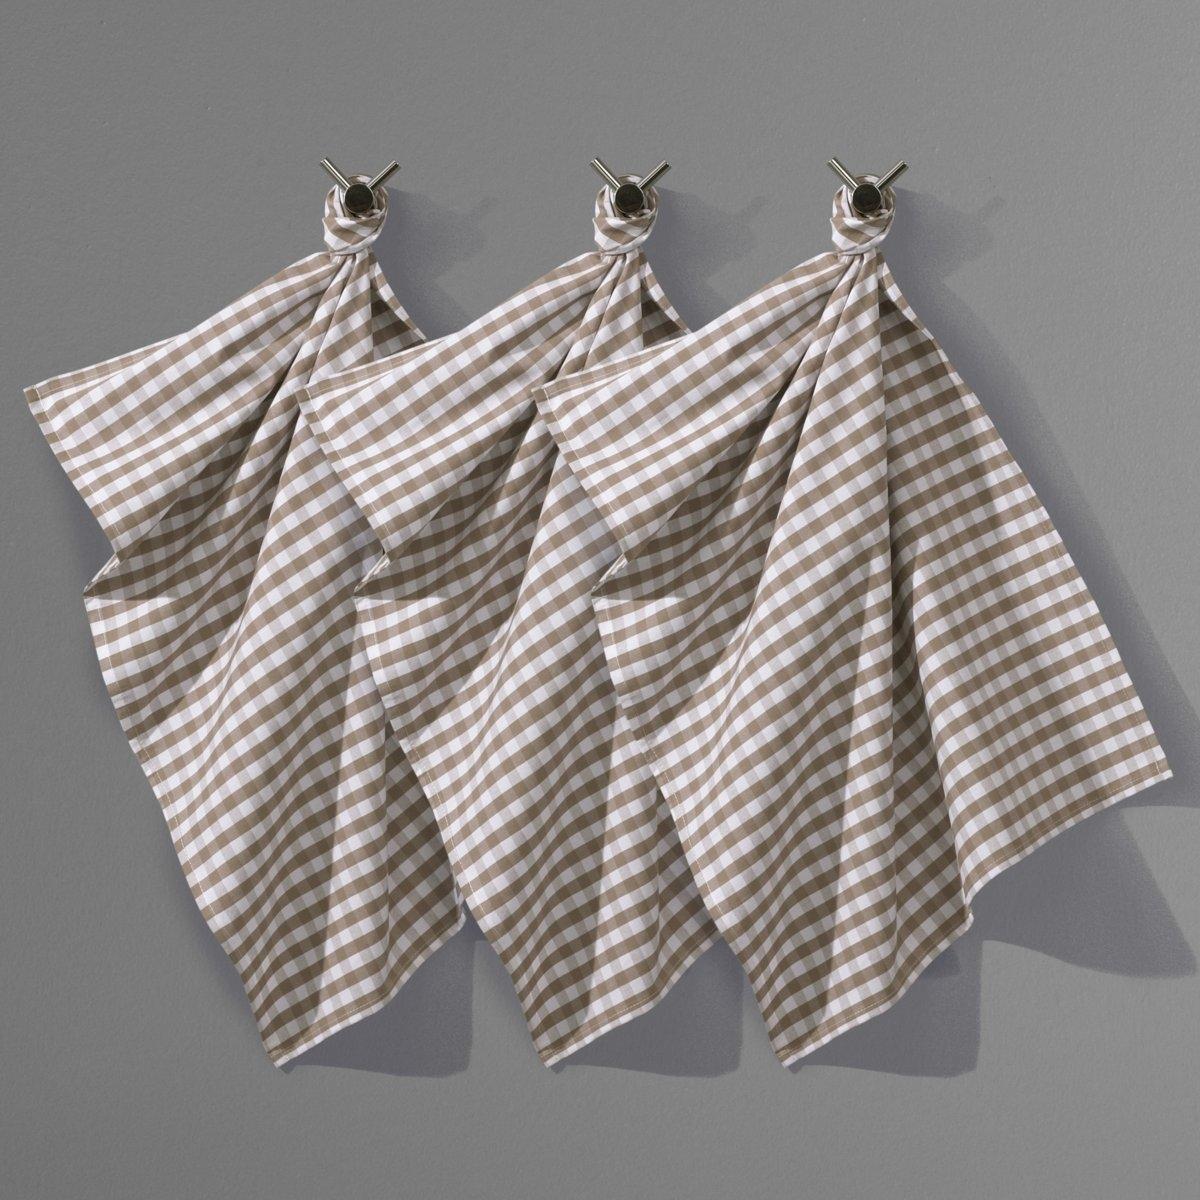 3 полотенца кухонных от La Redoute